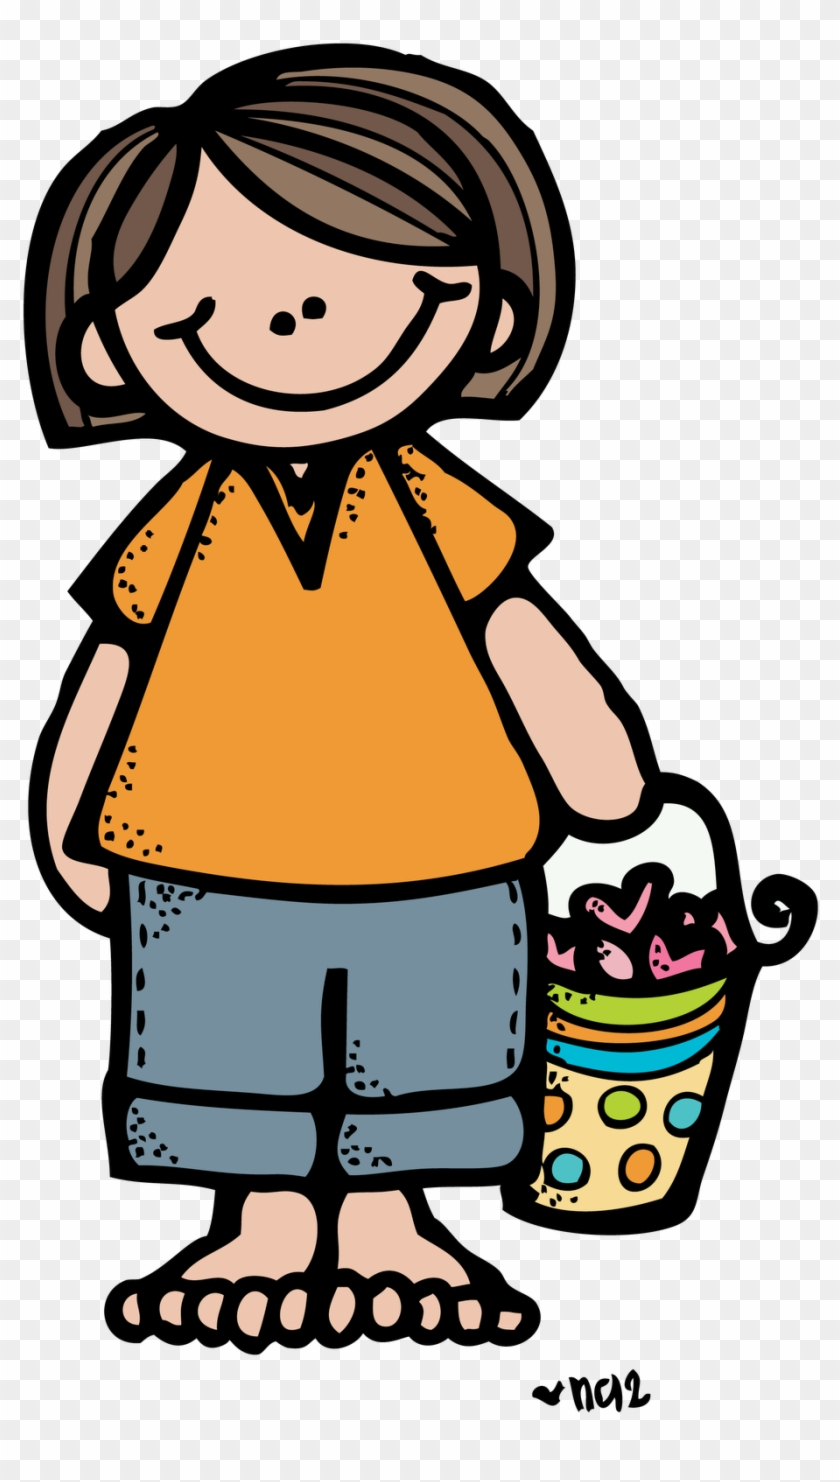 goldilocks clipart cliparthut mom clipart lds free transparent rh clipartmax com goldilocks clipart goldilocks clipart